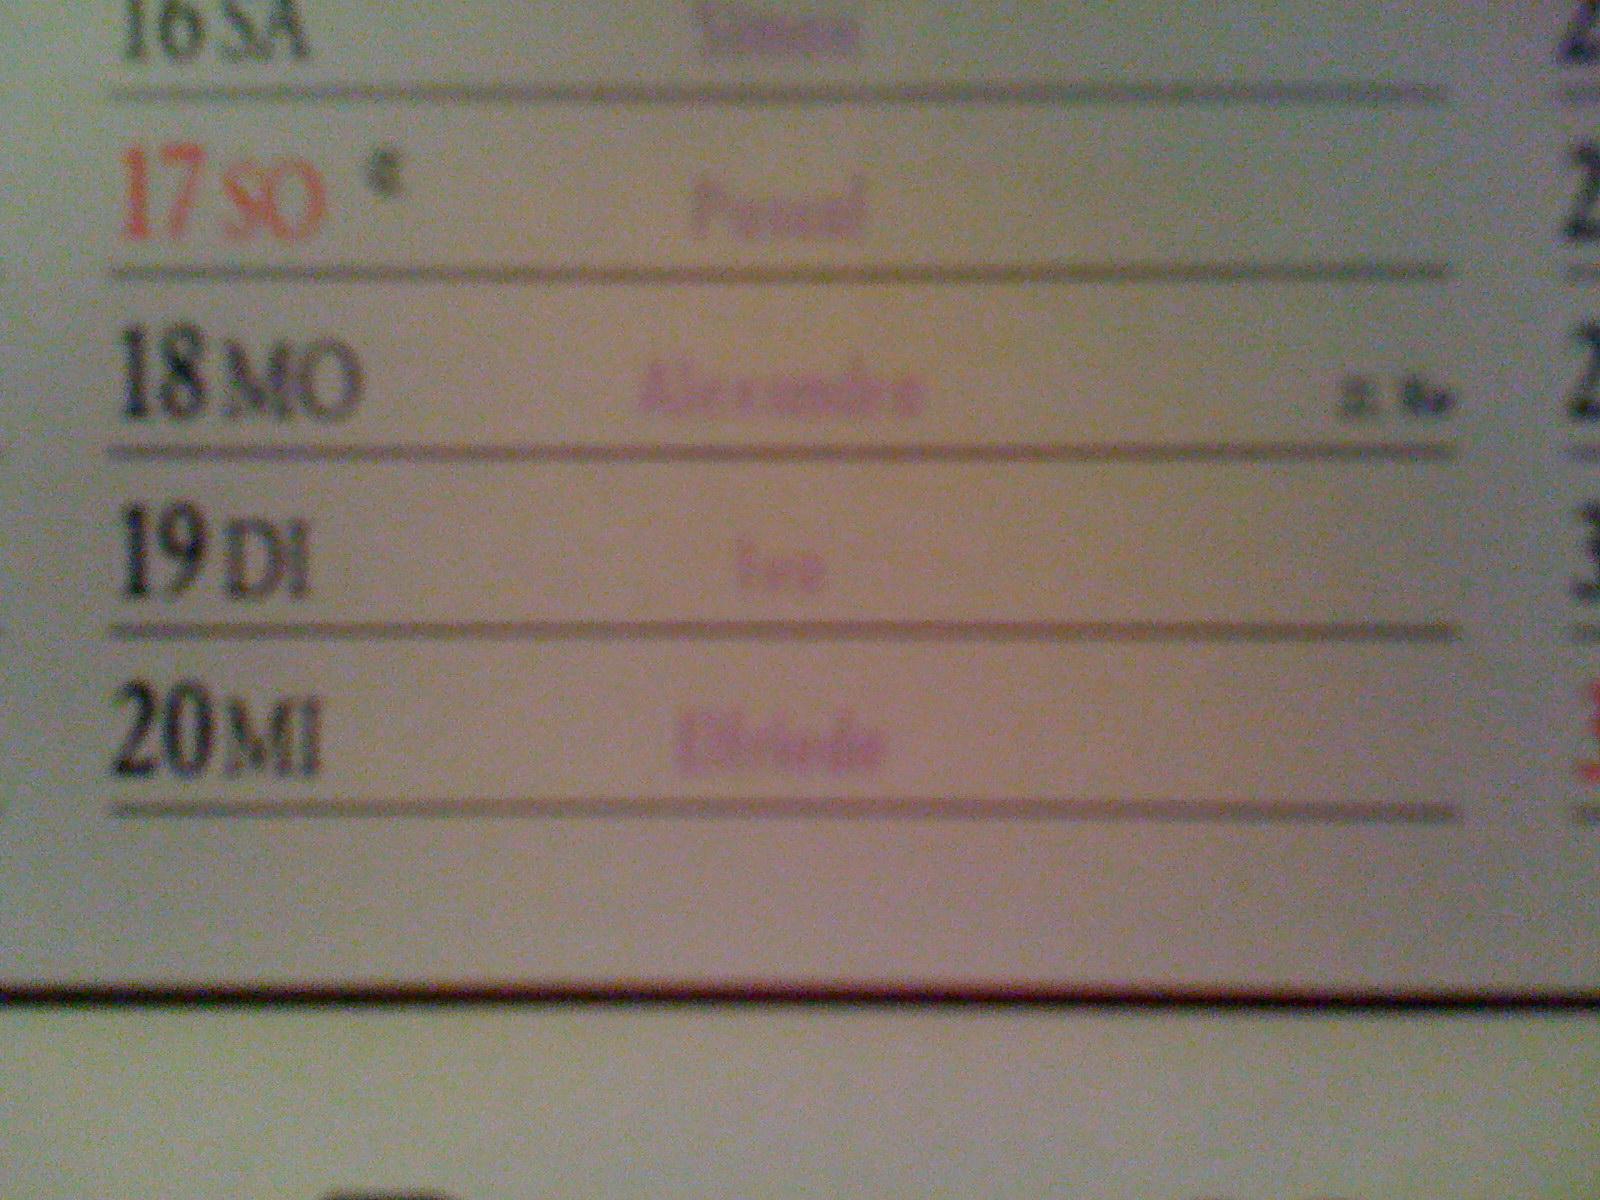 ivos-namenstag-kalender